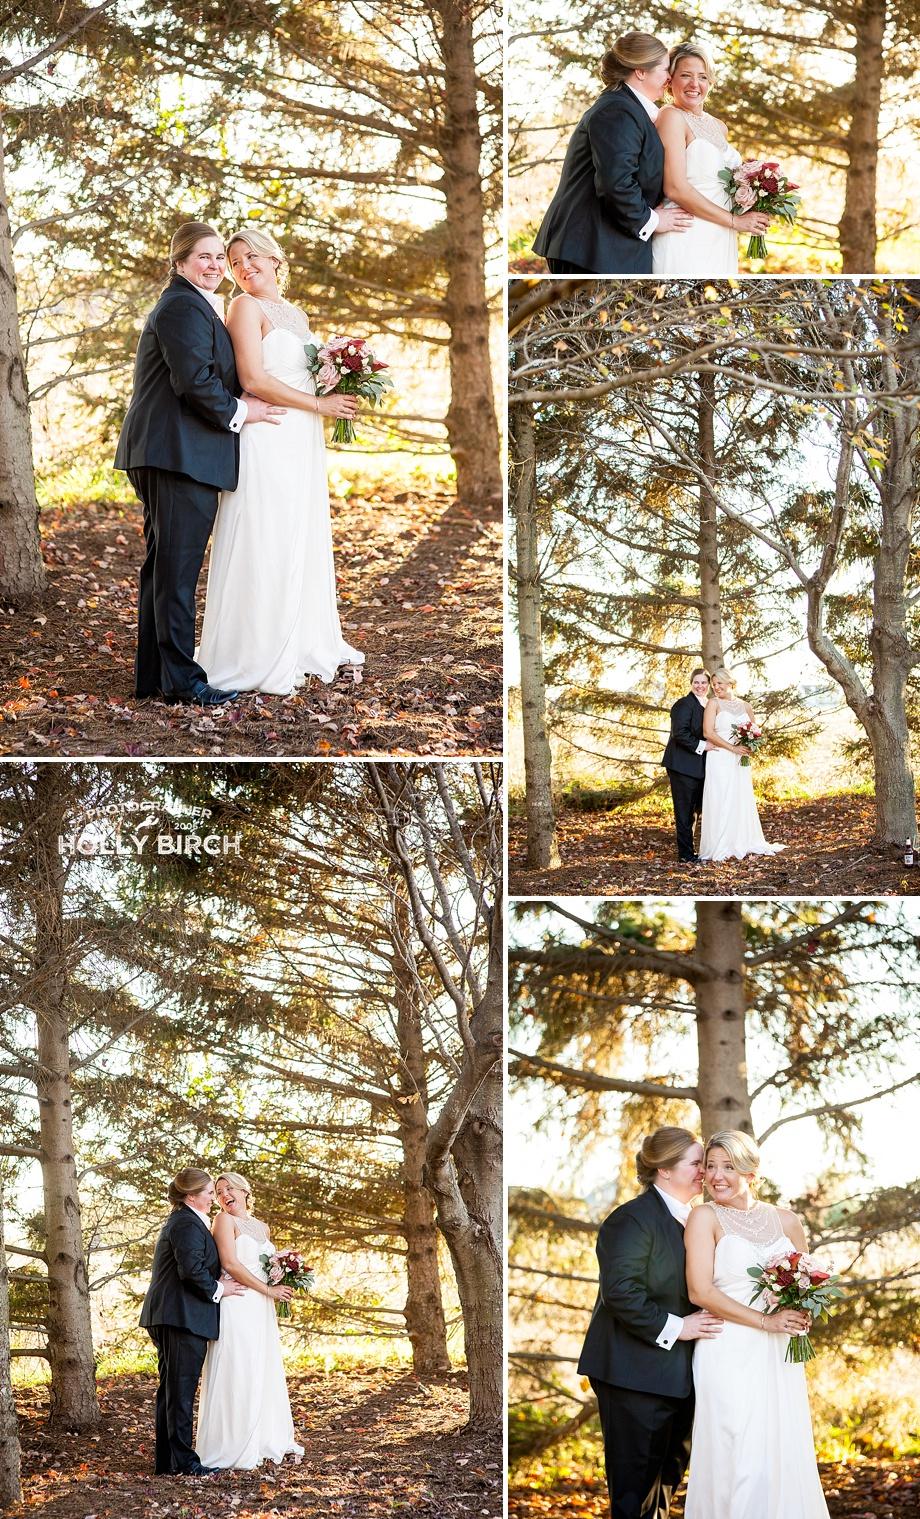 romantic wedding photos with autumn trees